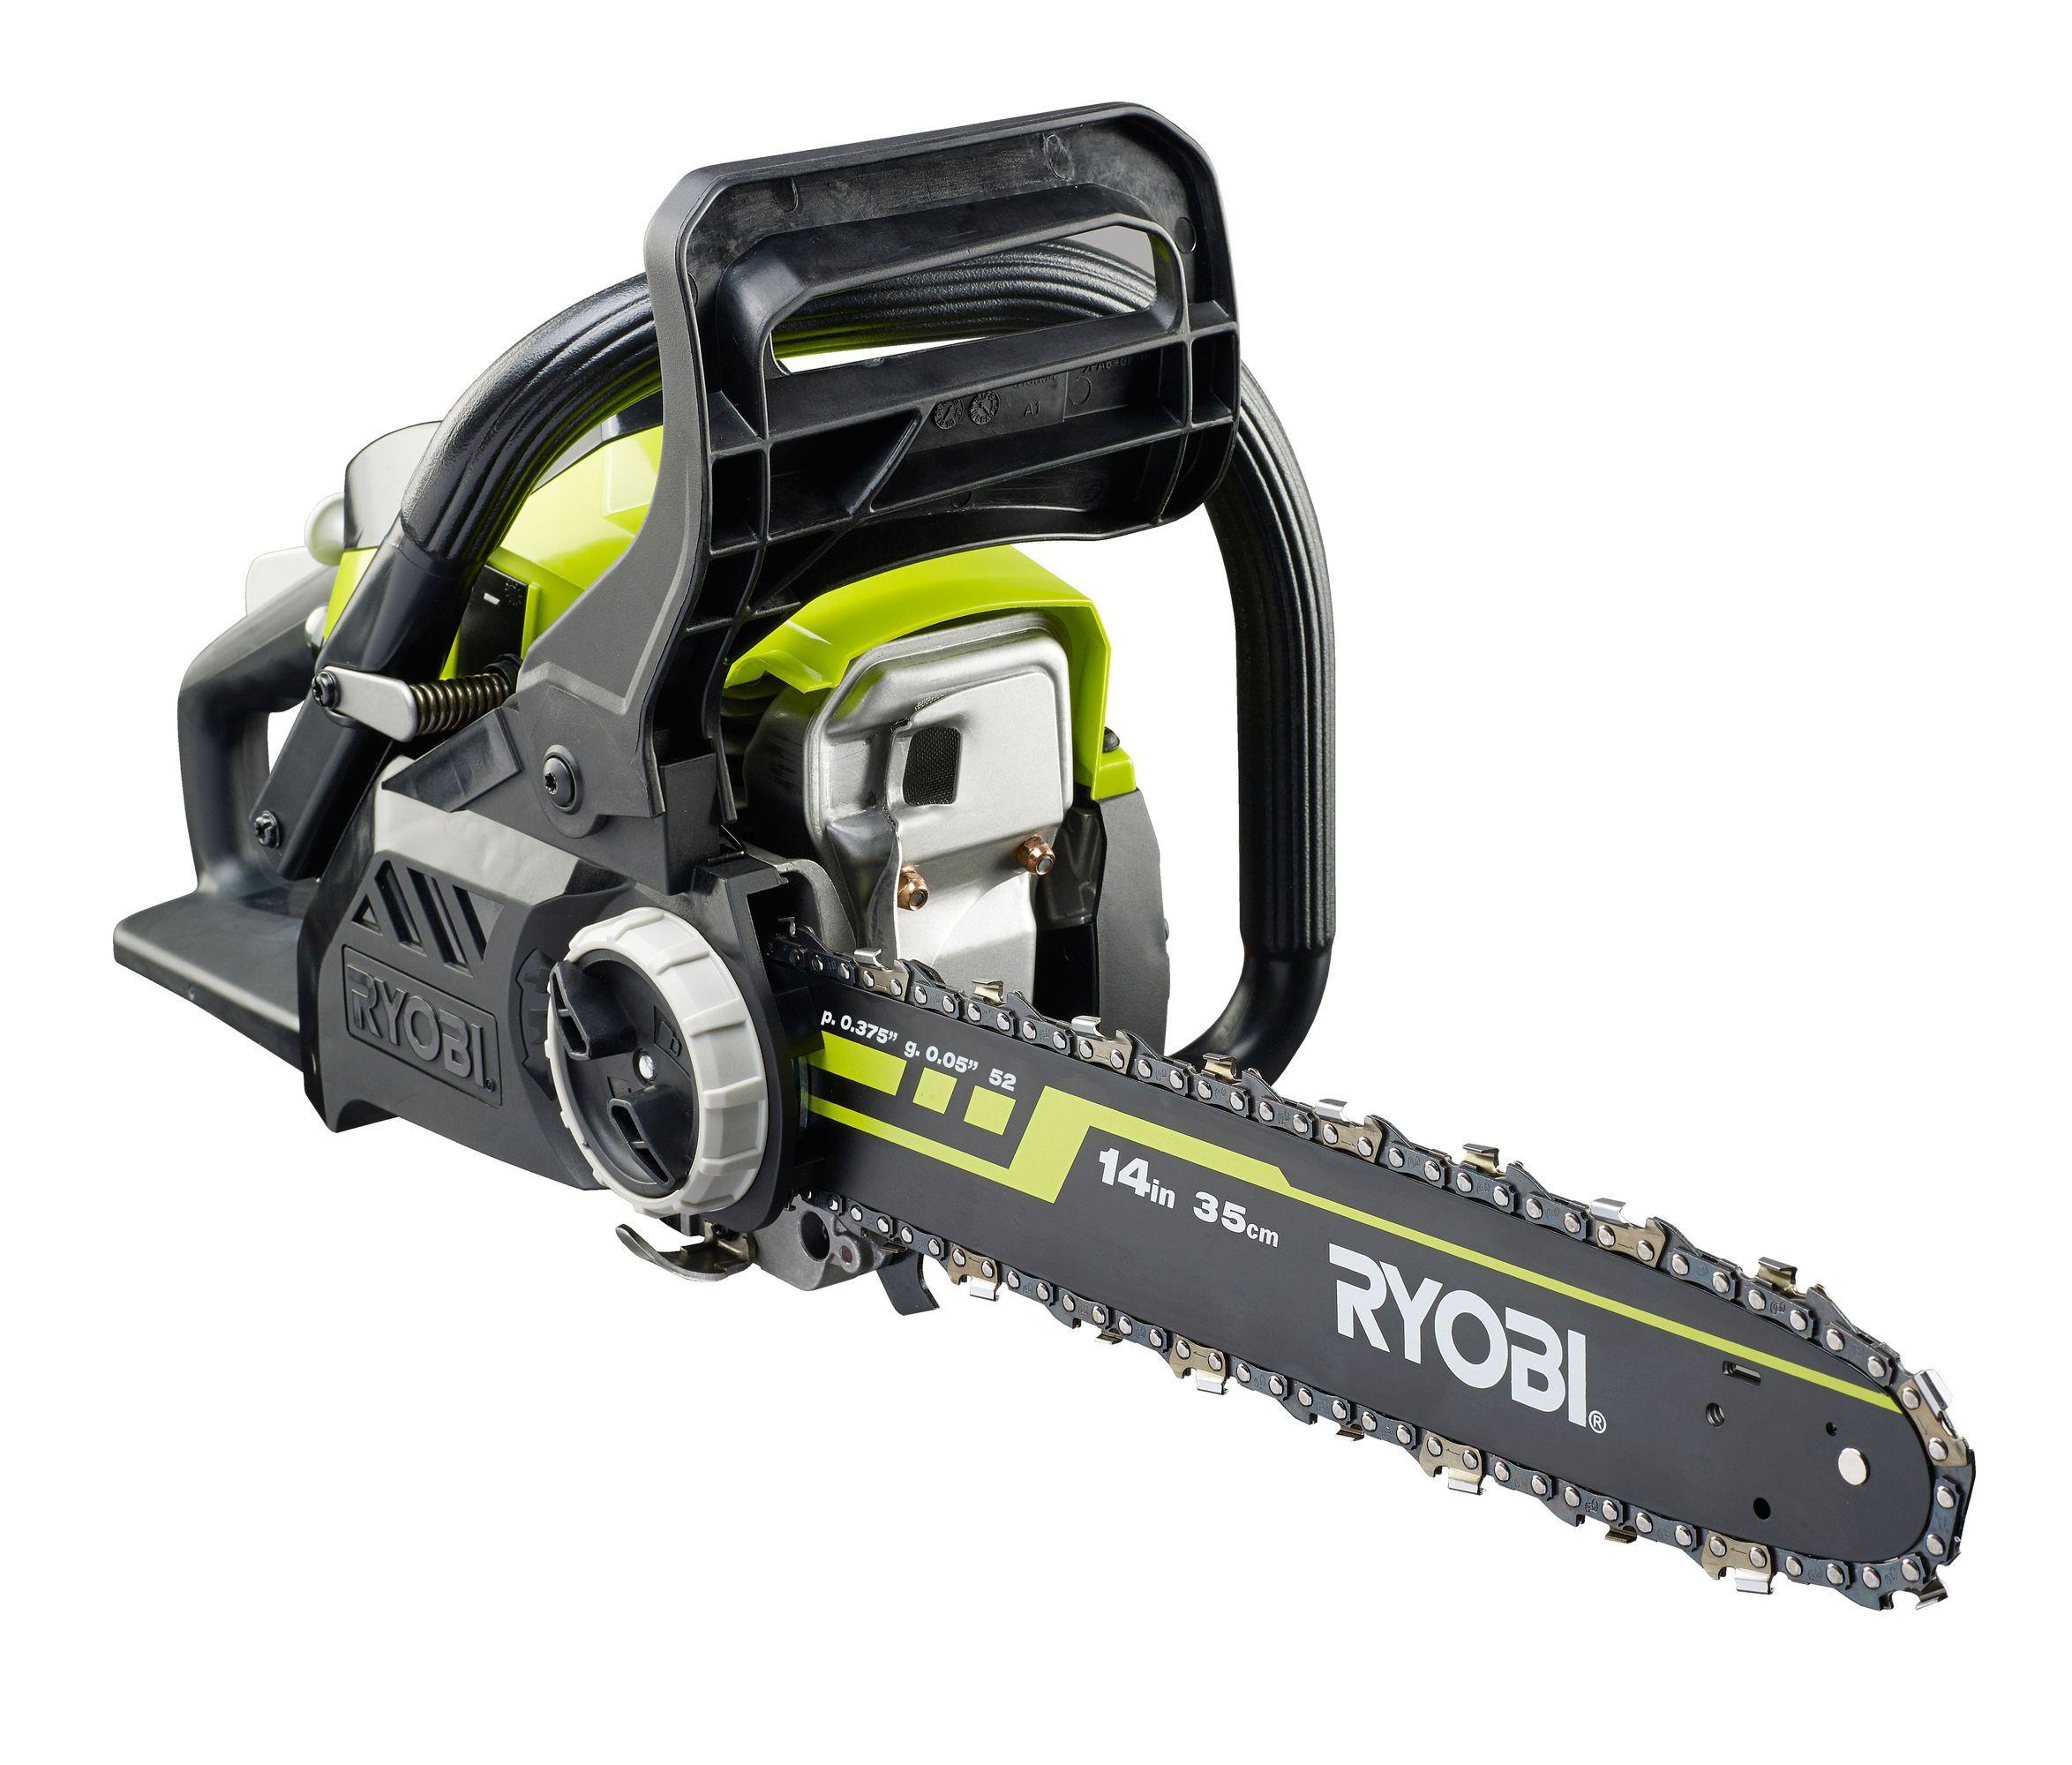 Ryobi RCS3835T 37.2 cc Petrol Chainsaw